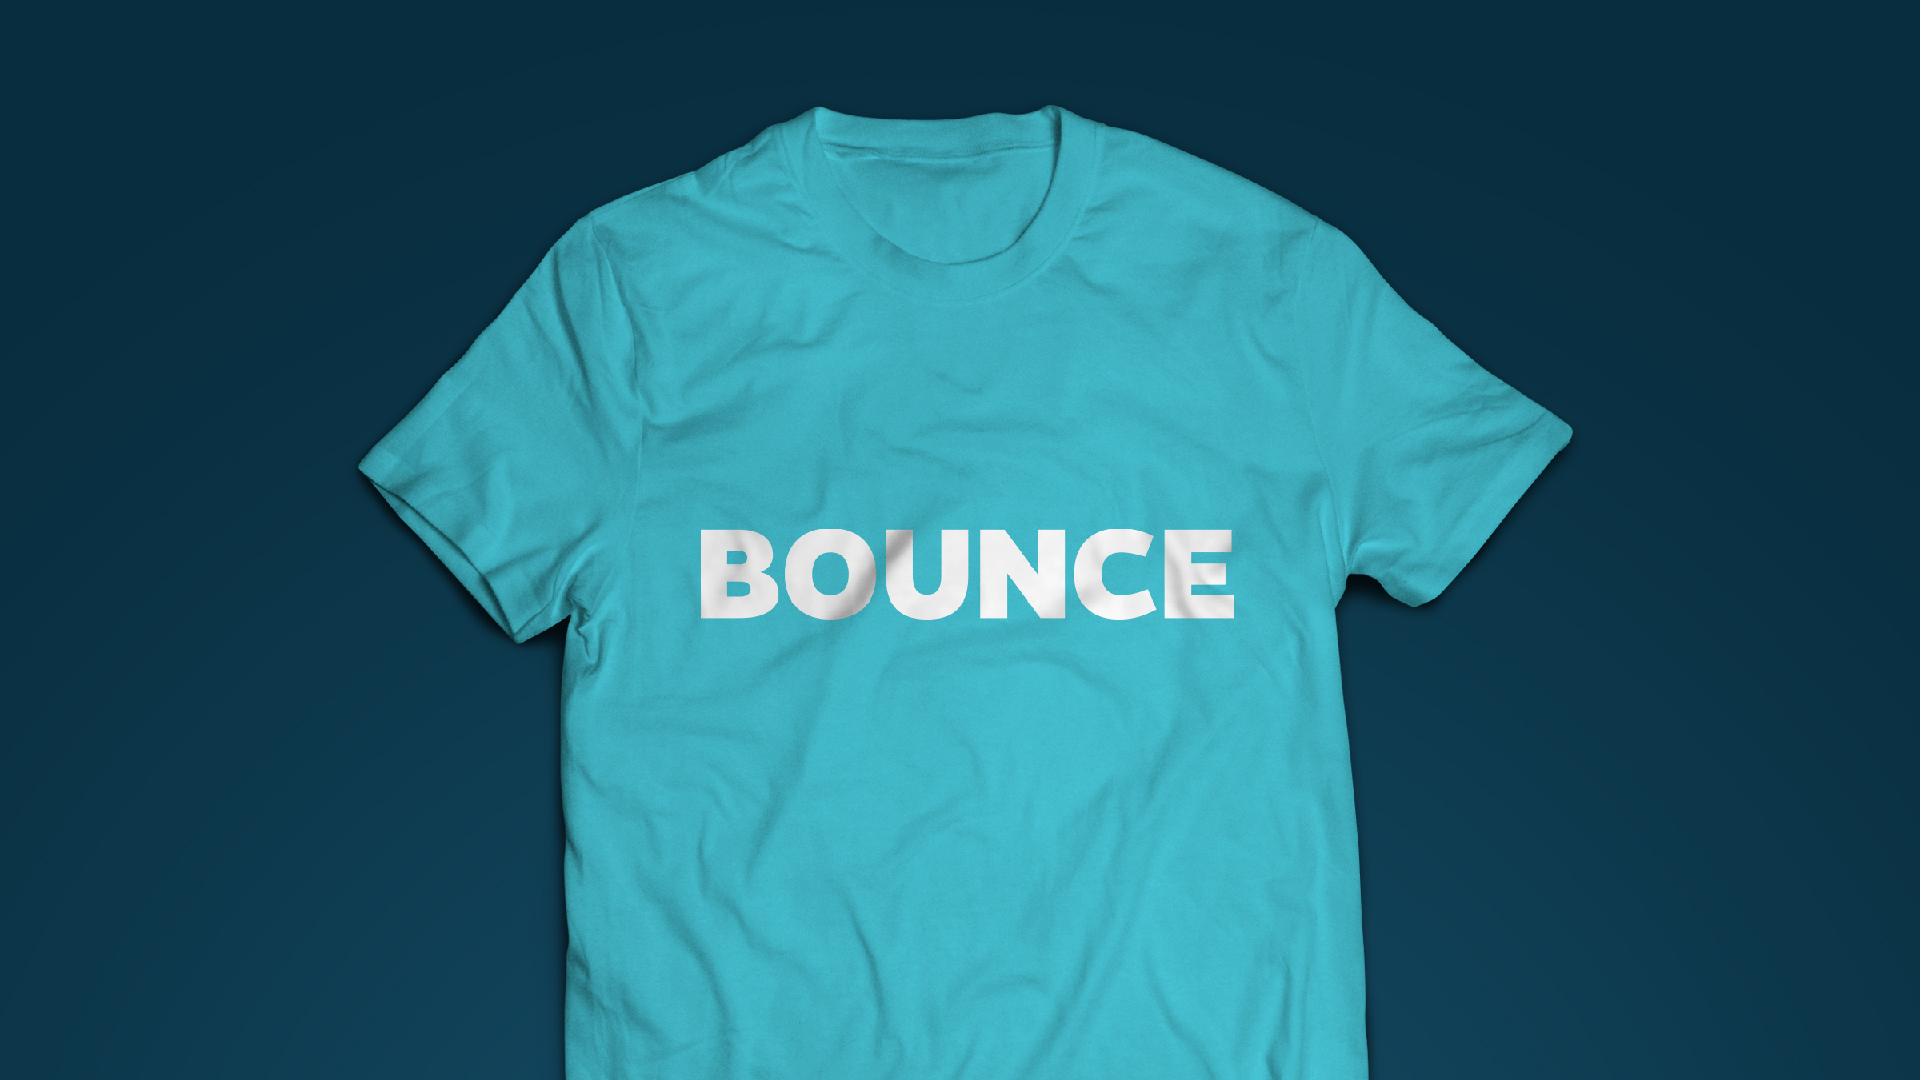 bouncedeck-08.jpg